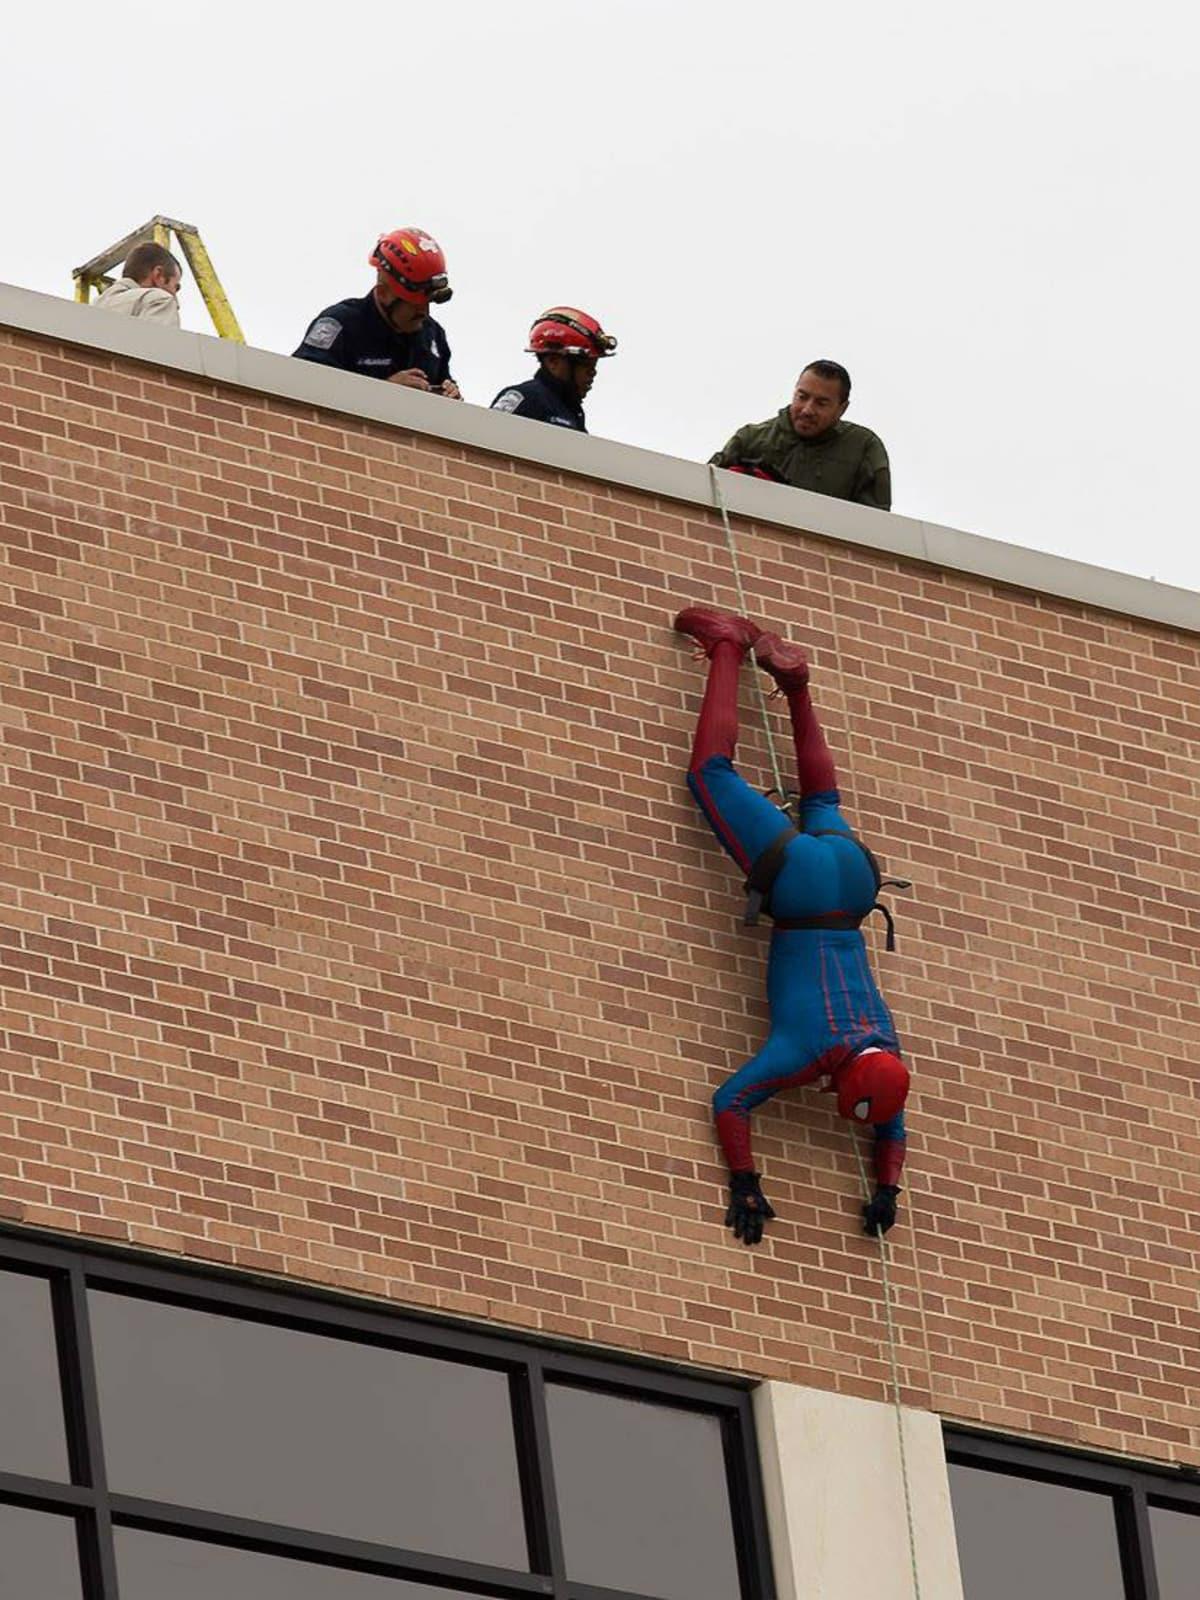 Superhero Drop